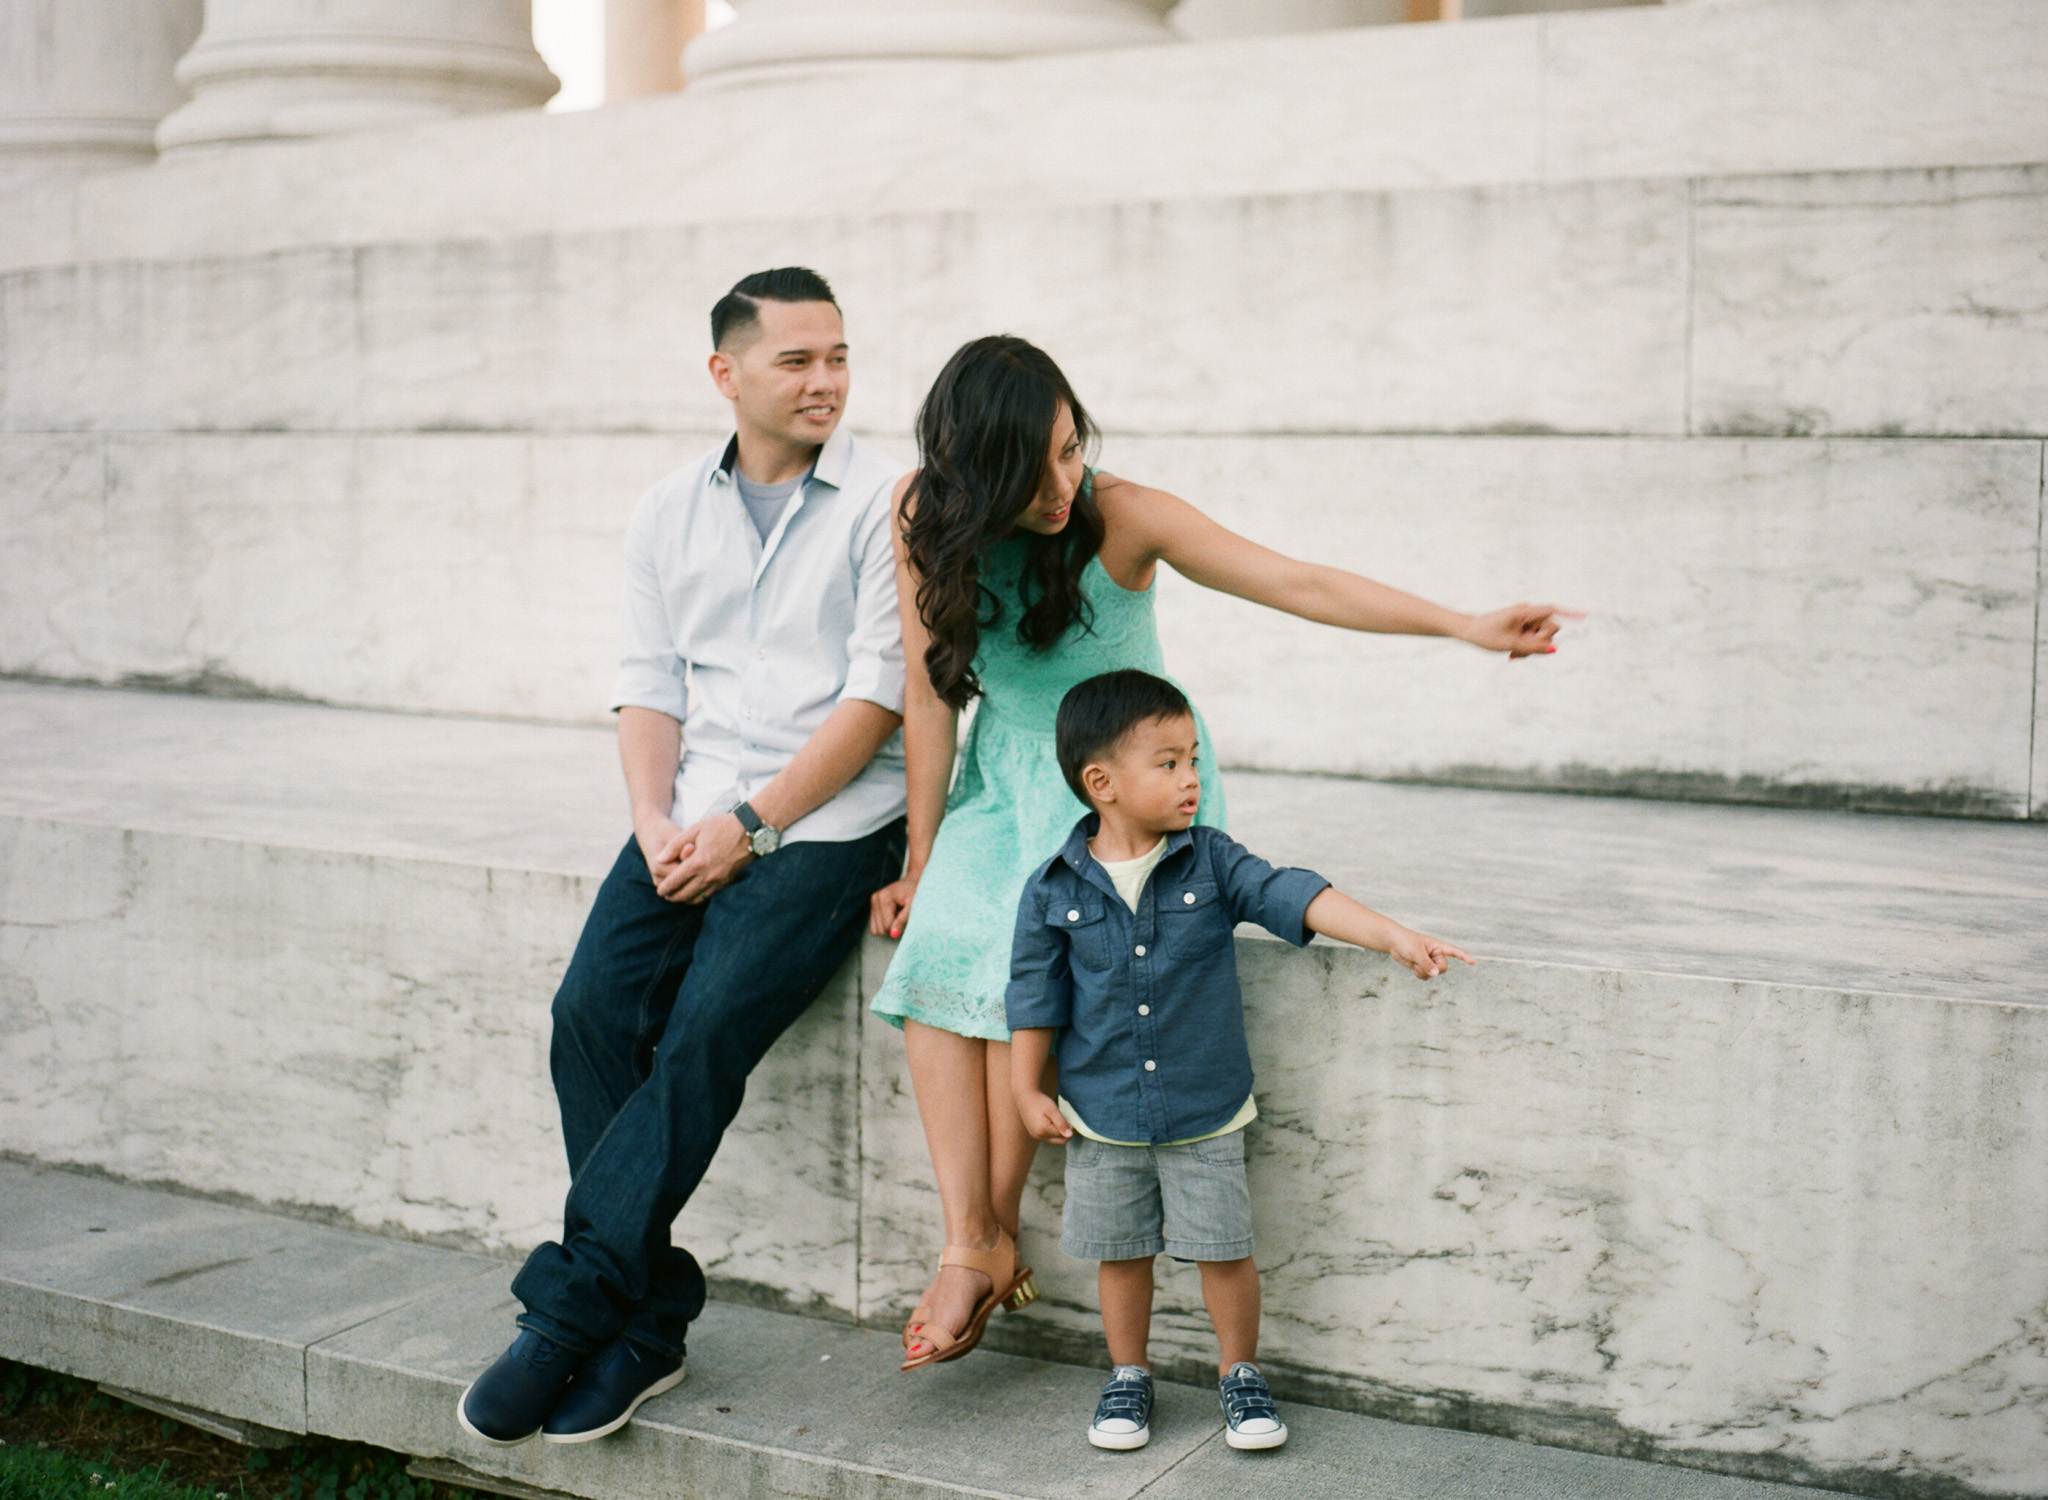 Jefferson-Memorial-Portrait-Photographer-30.jpg